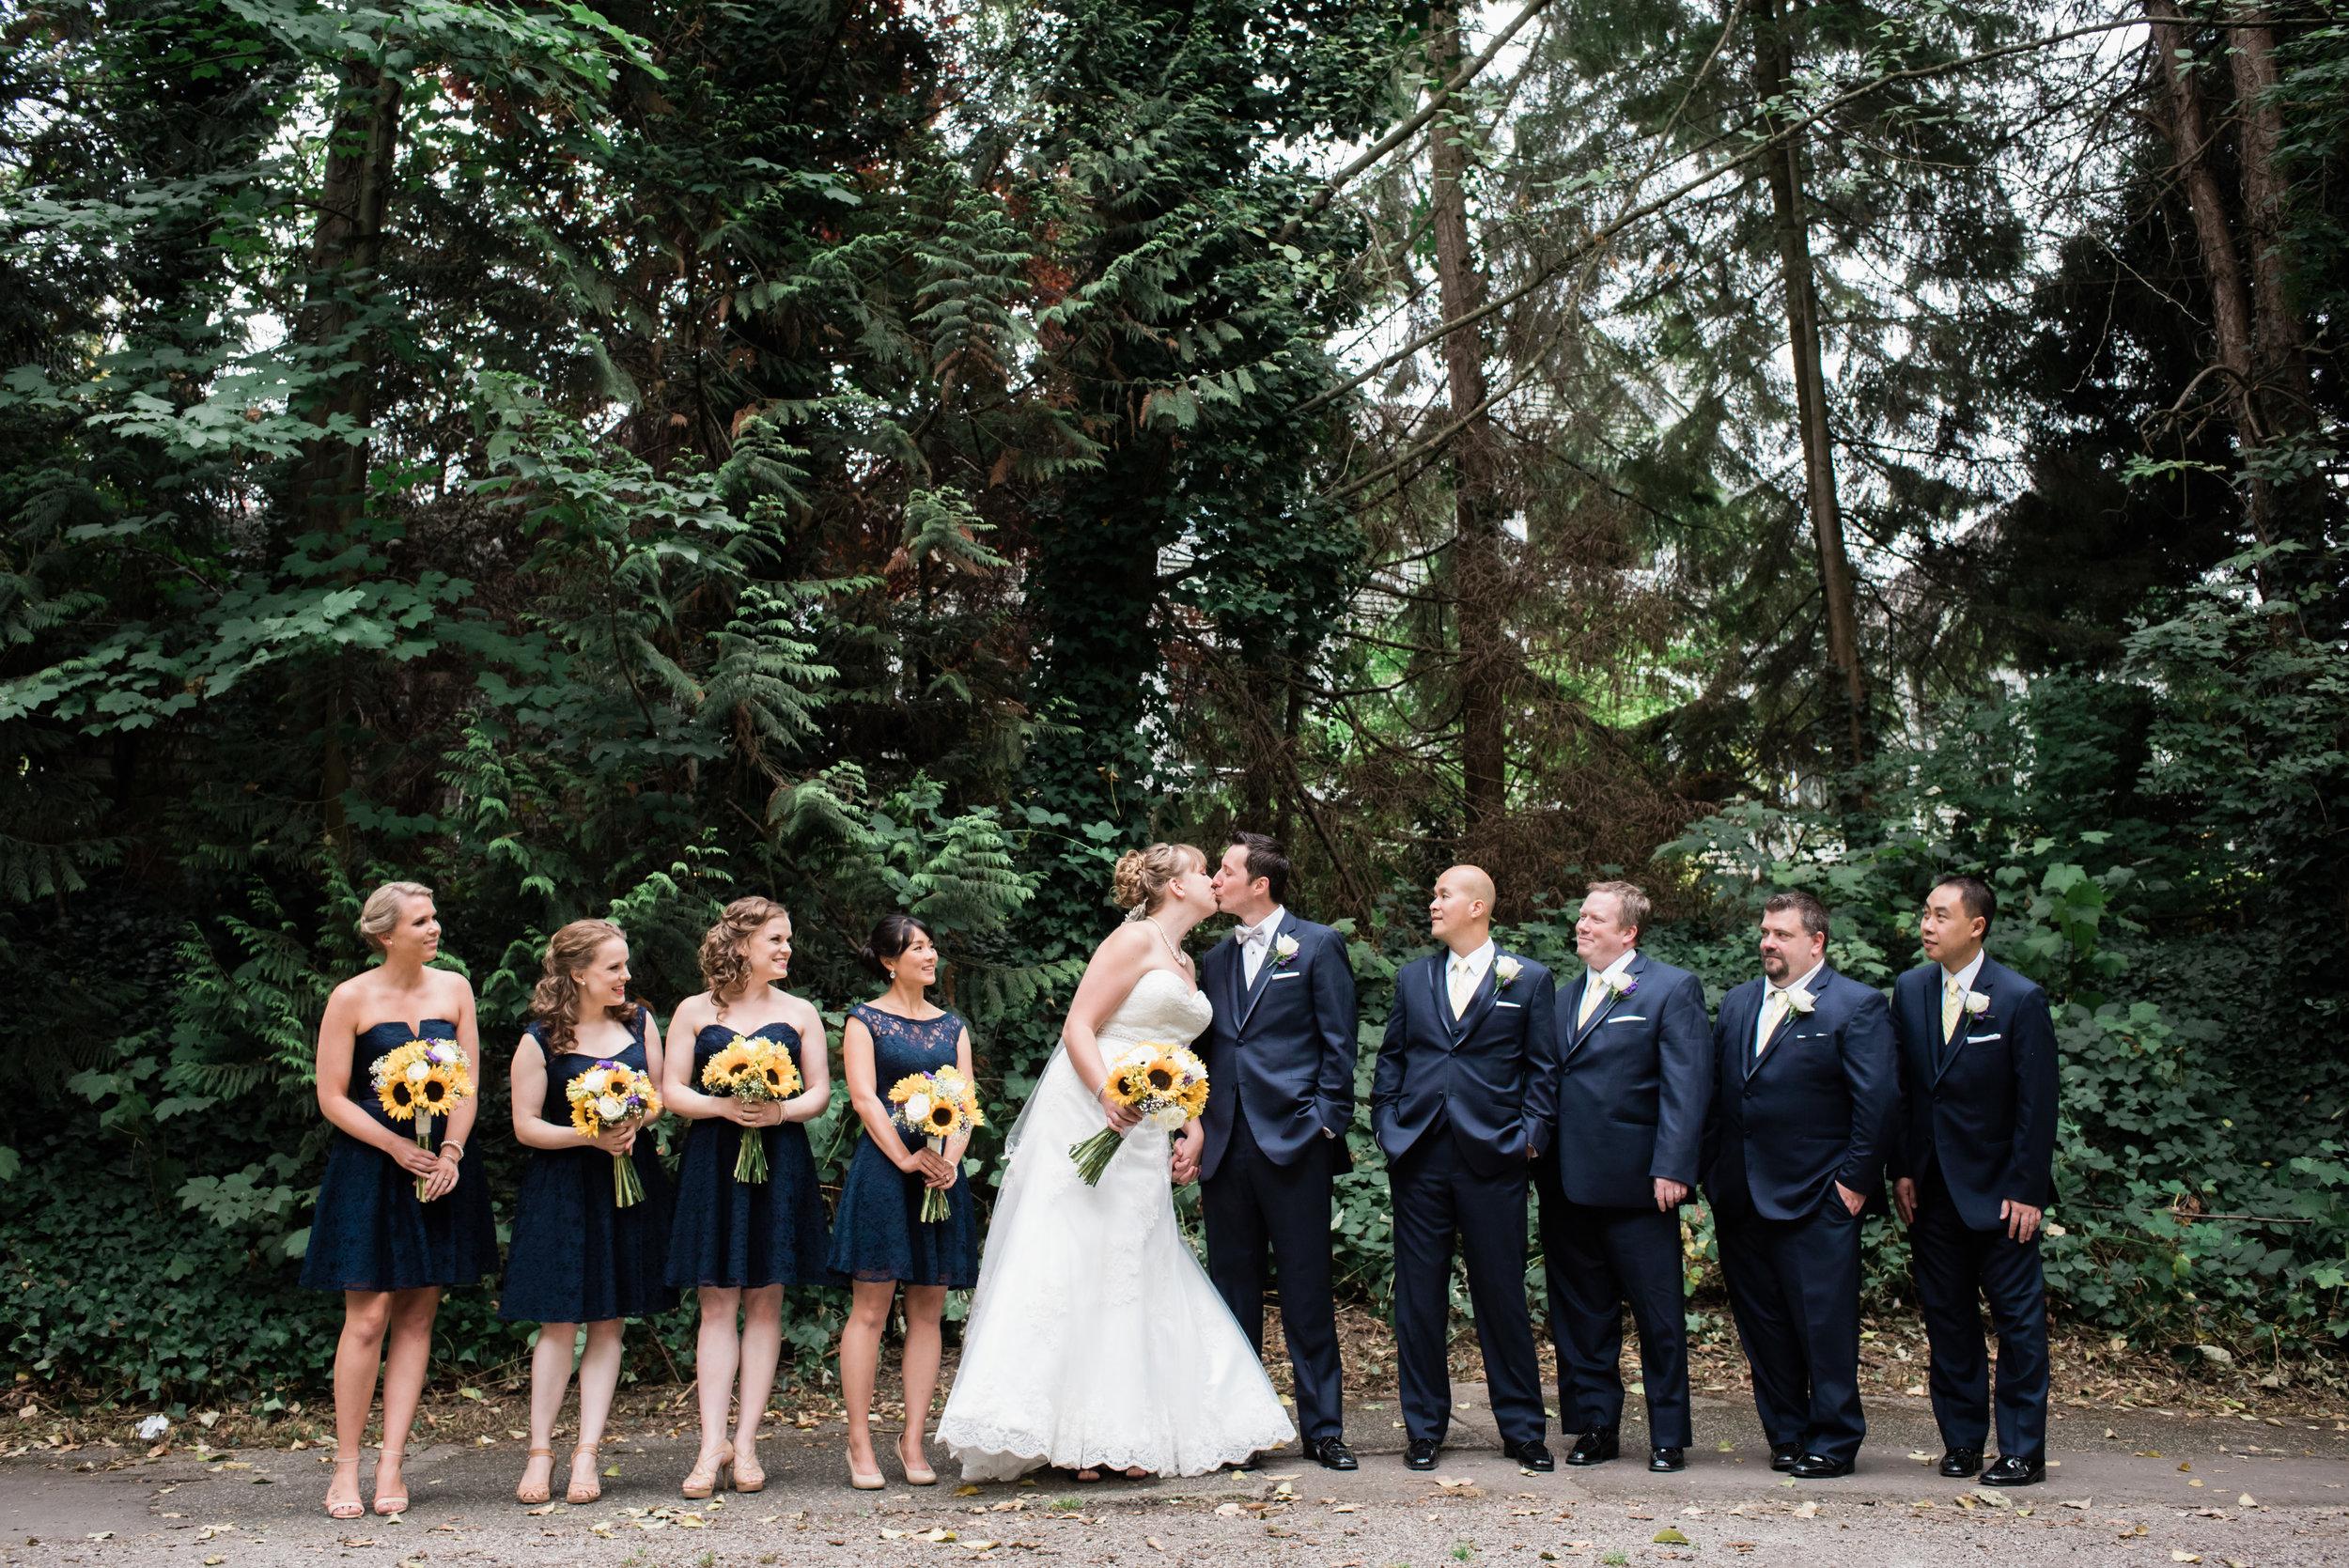 Amanda-rene-wedding-0449-jelger-tanja-photographers.jpg